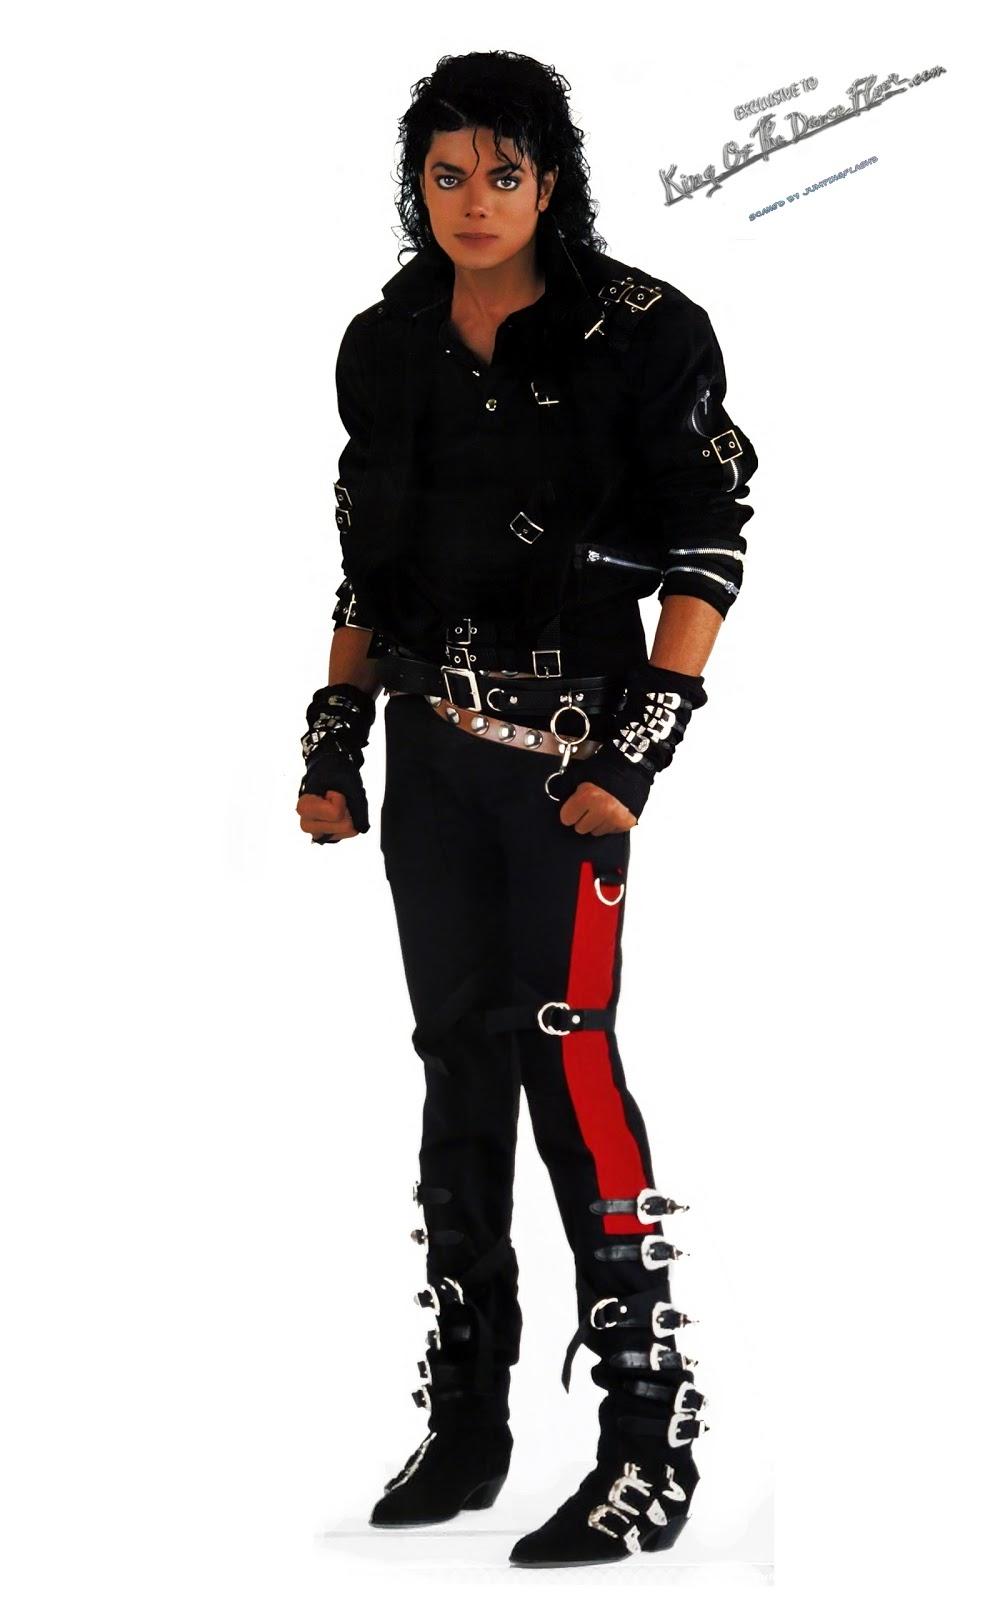 Michael Jackson Photoshoots Hq Michael Jackson 31043155 1600 2560.jpg